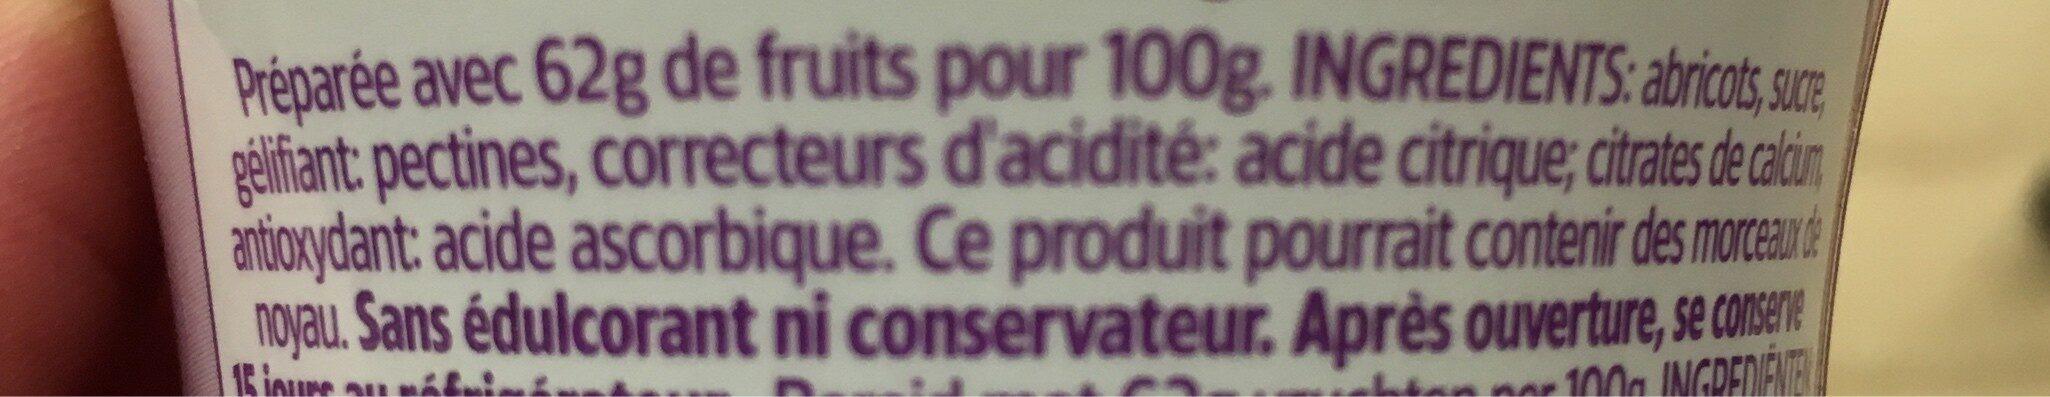 Confiture D'abricots Enjoy - Ingrediënten - fr